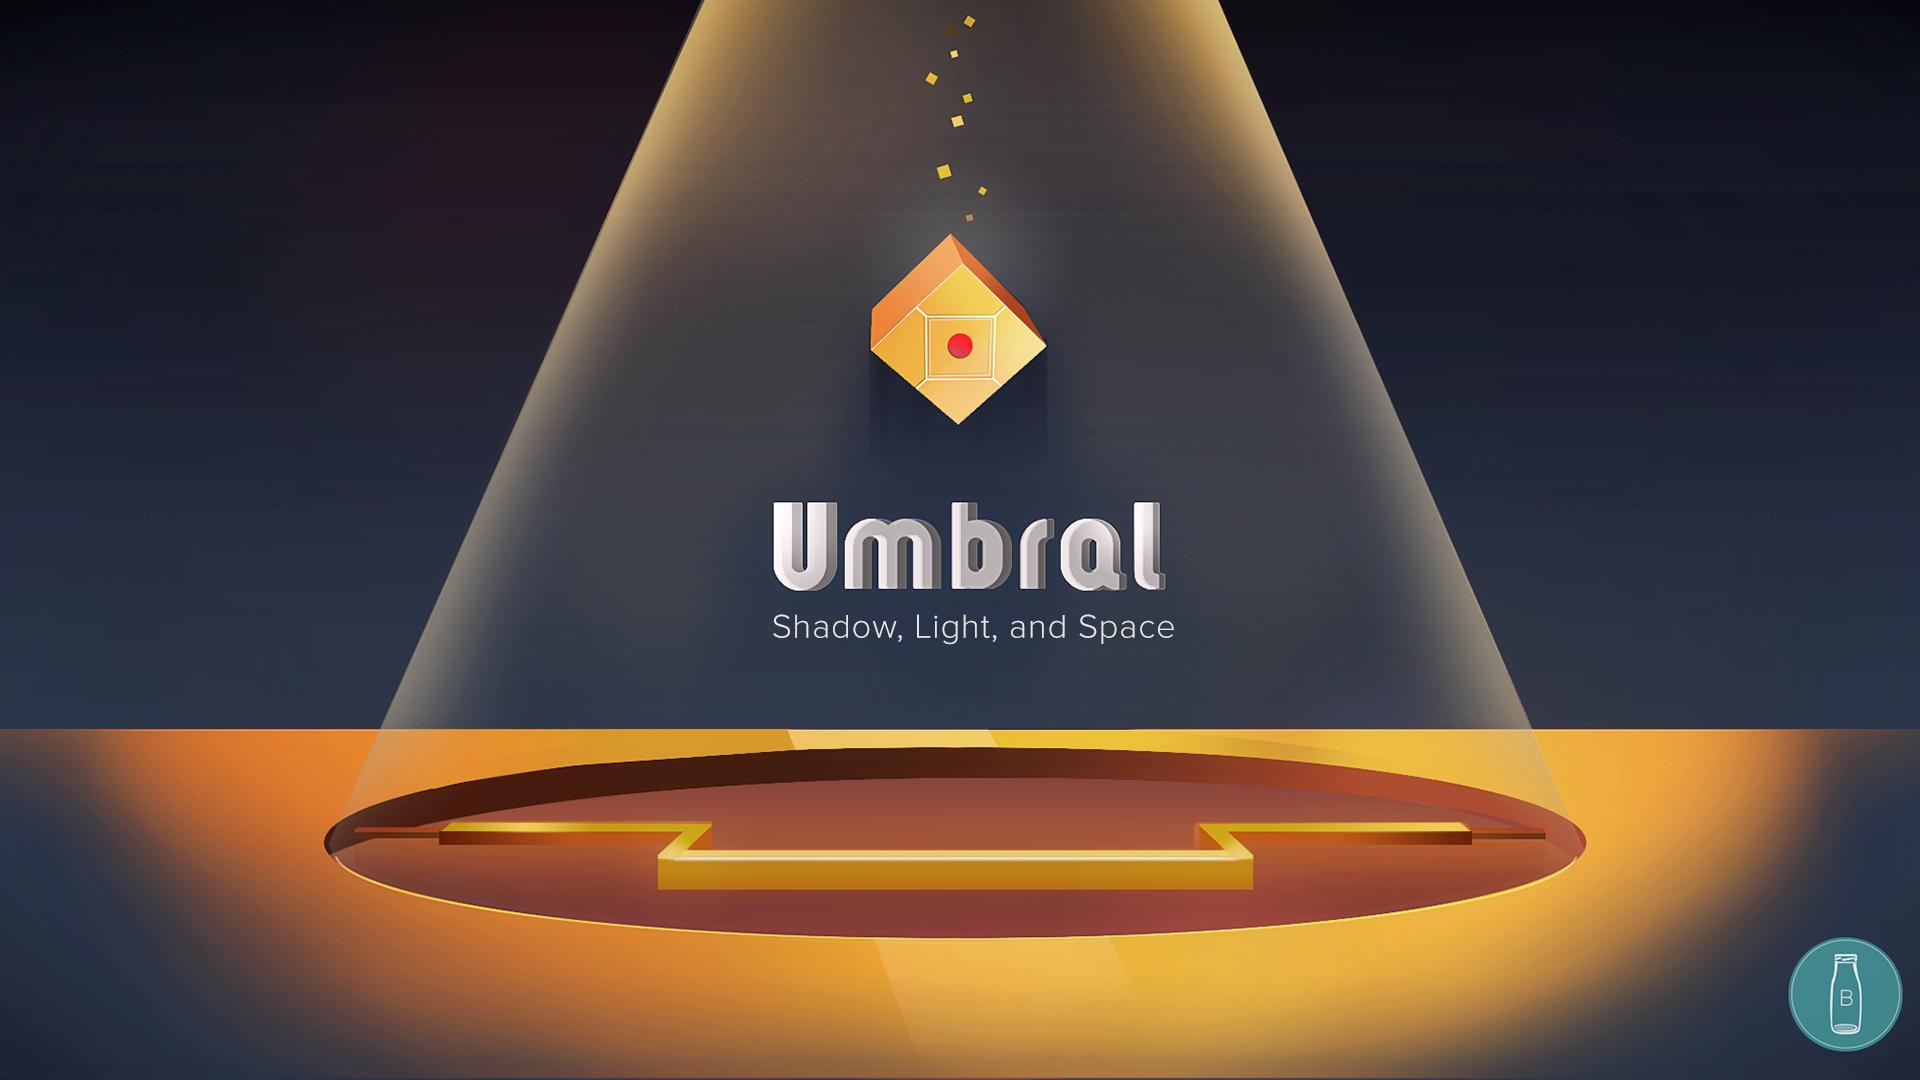 Umbral_image.png